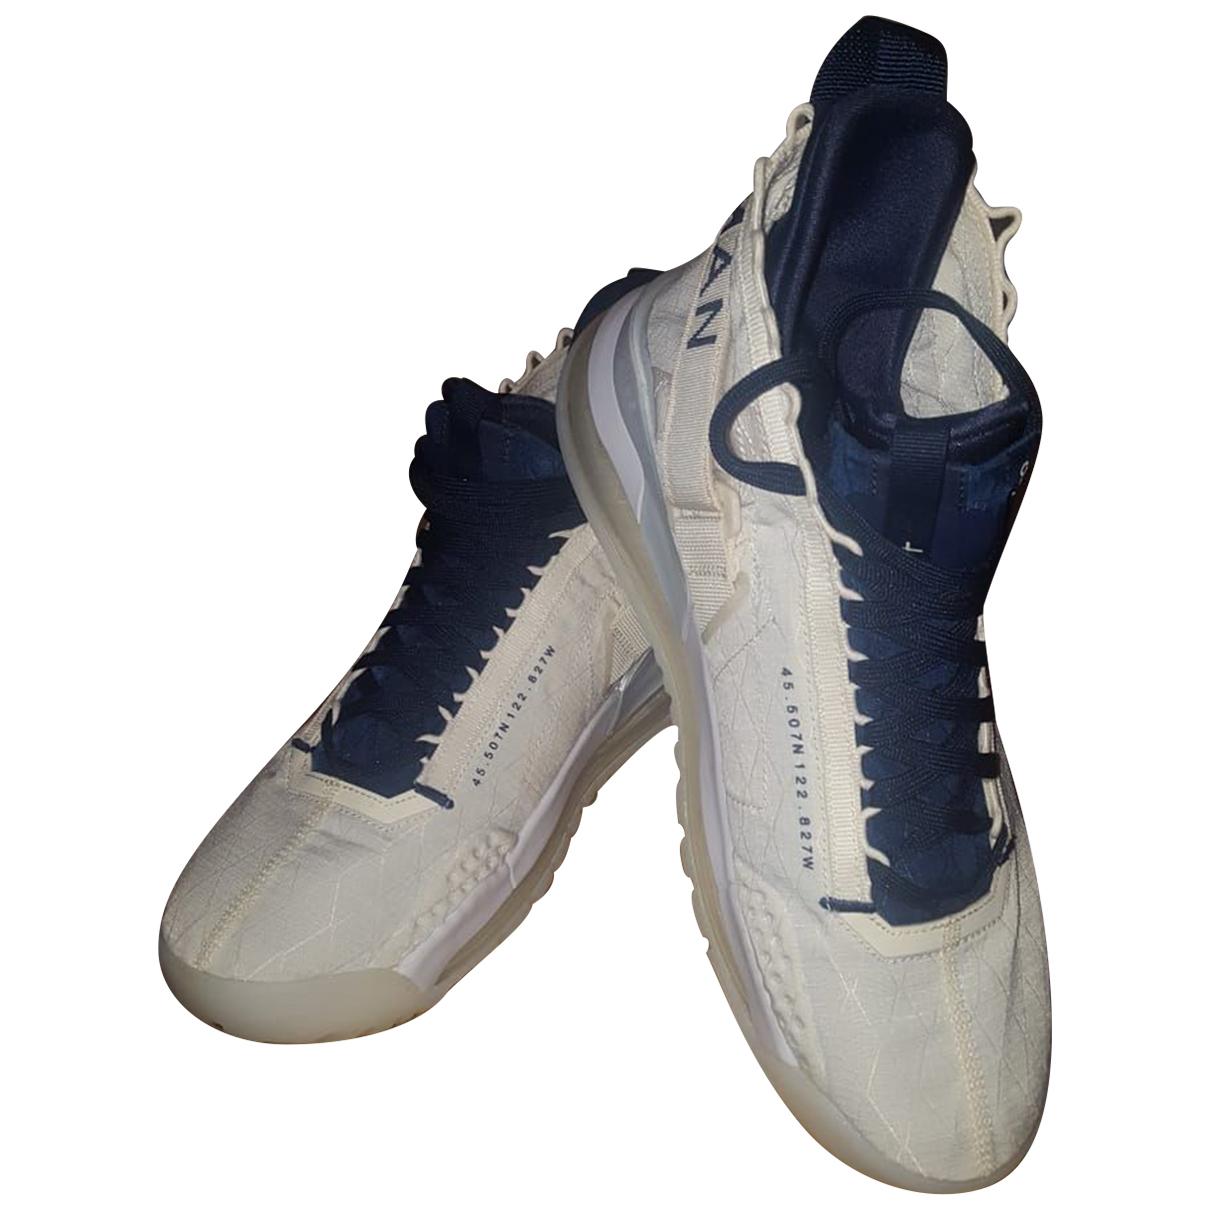 Jordan \N Sneakers in  Beige Leinen